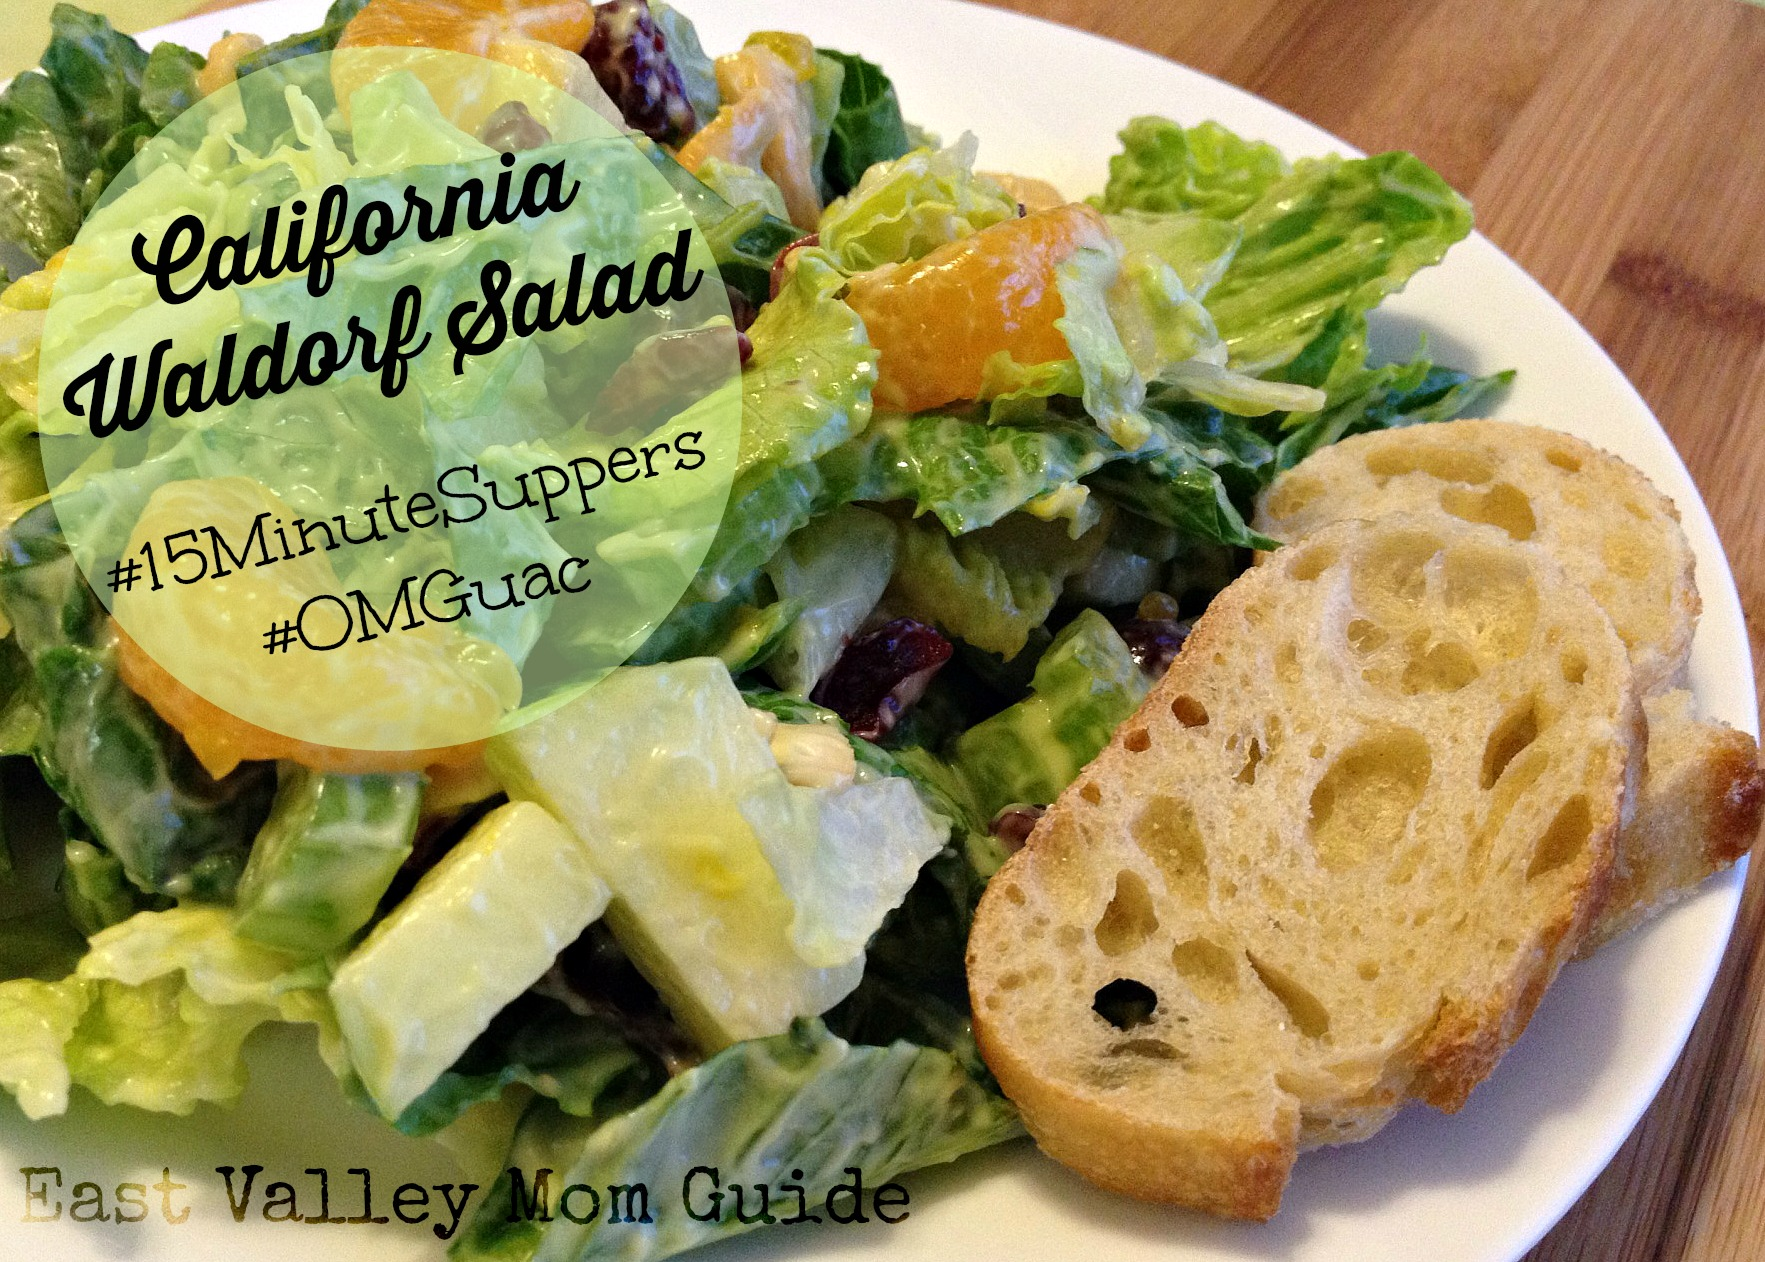 California Waldorf Salad #15MinuteSuppers #OMGuac